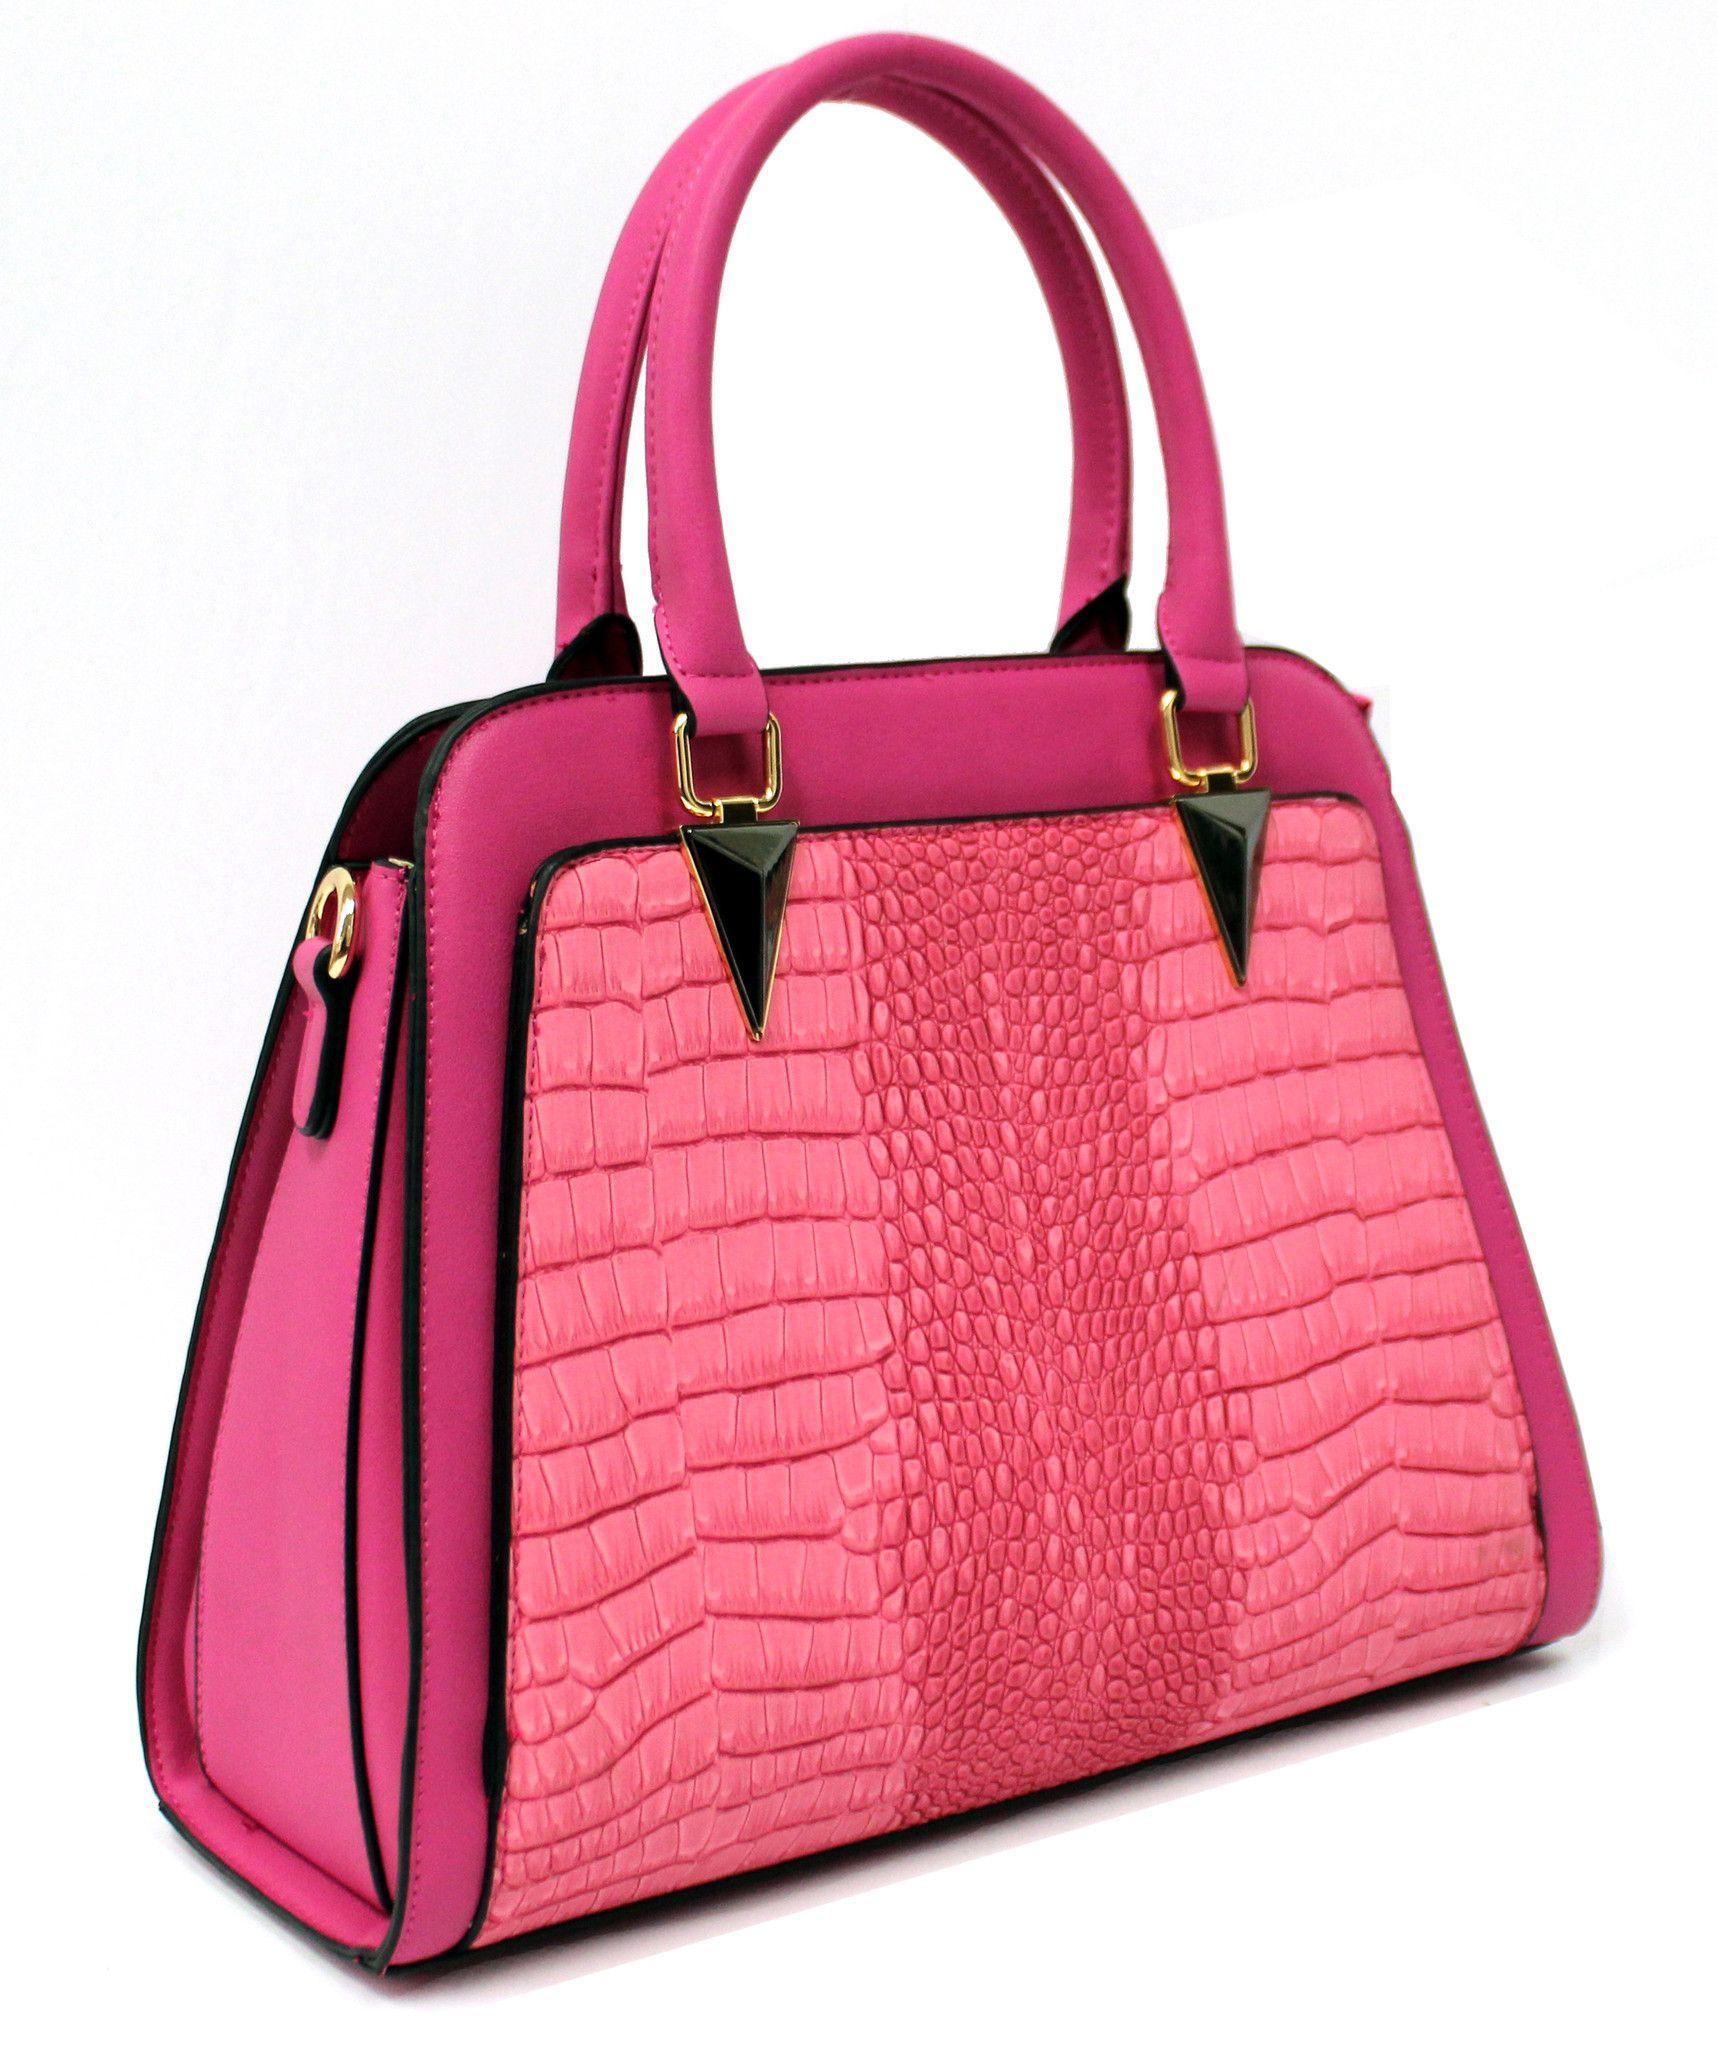 Rachel Croc Panel Handbag with Unique Hardware